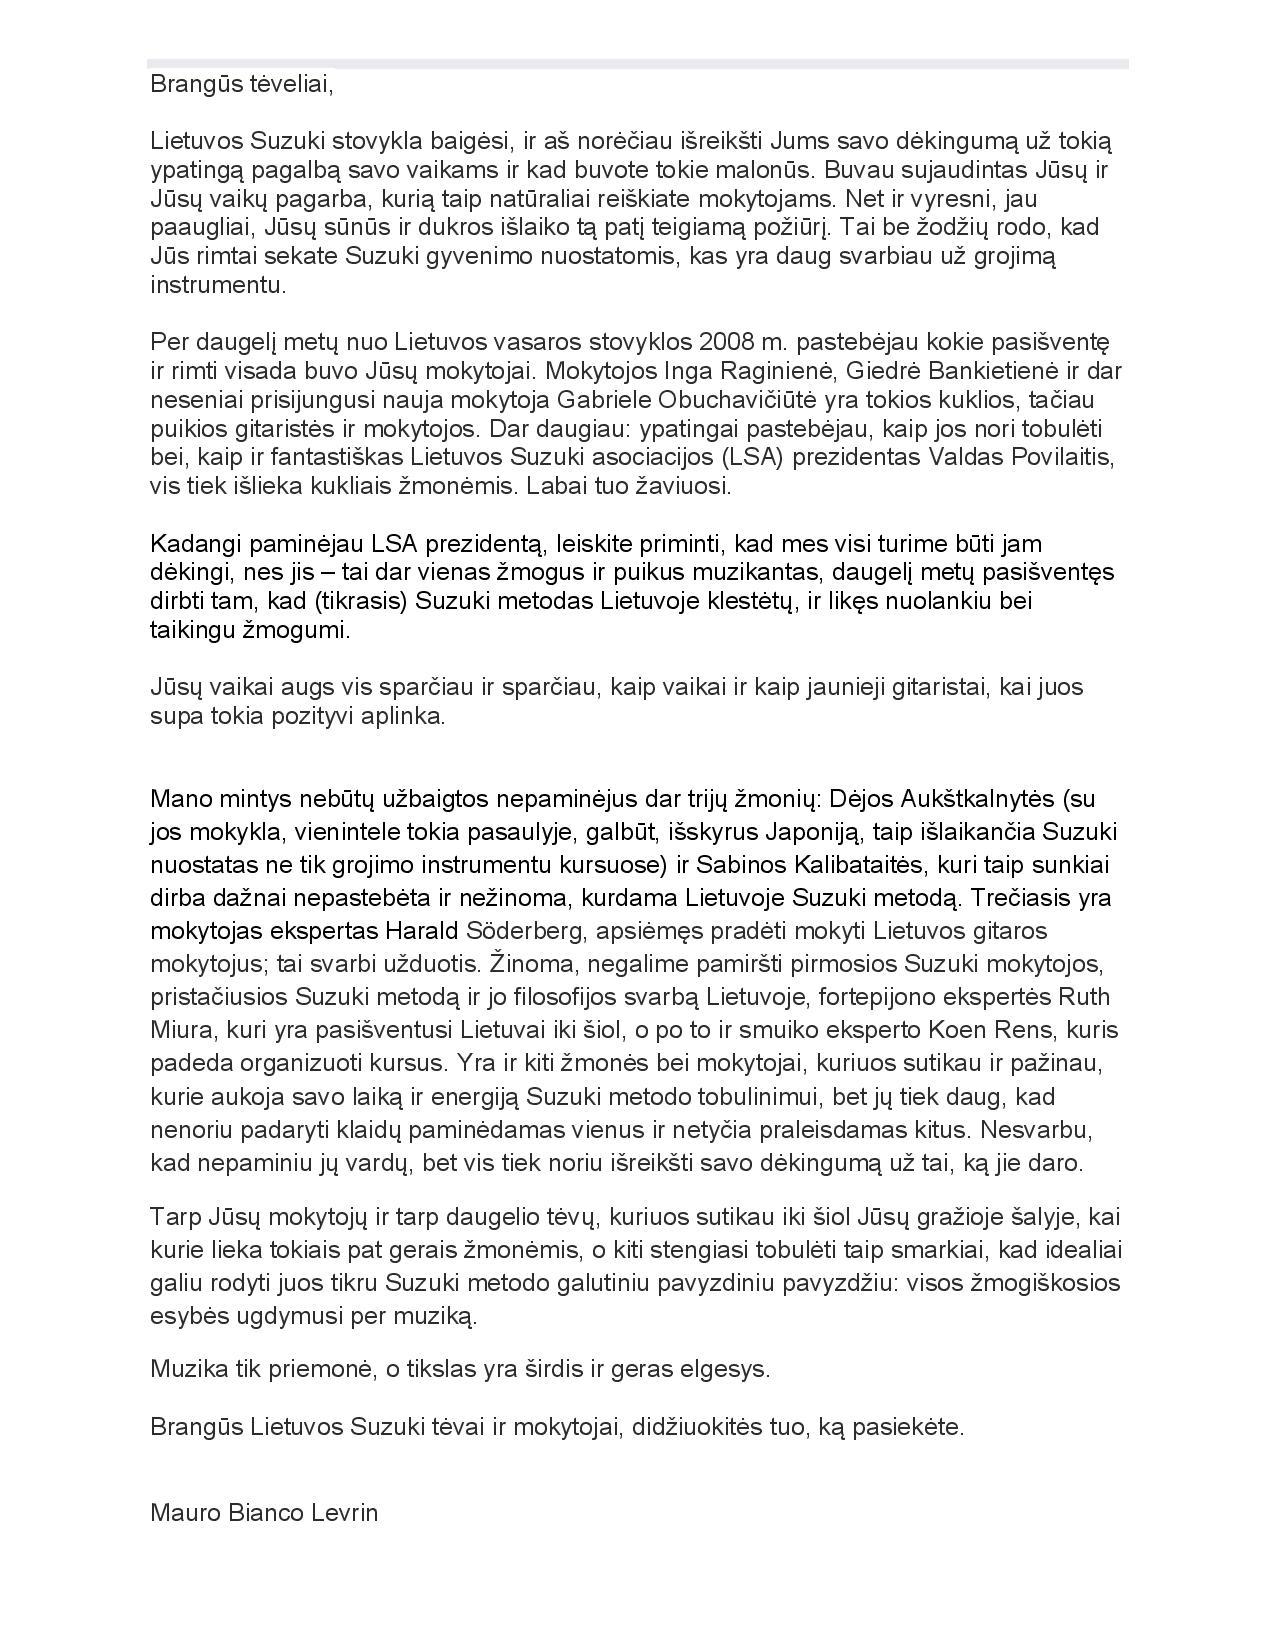 Mauro Bianco Levrin laiskas vertimas-page-001